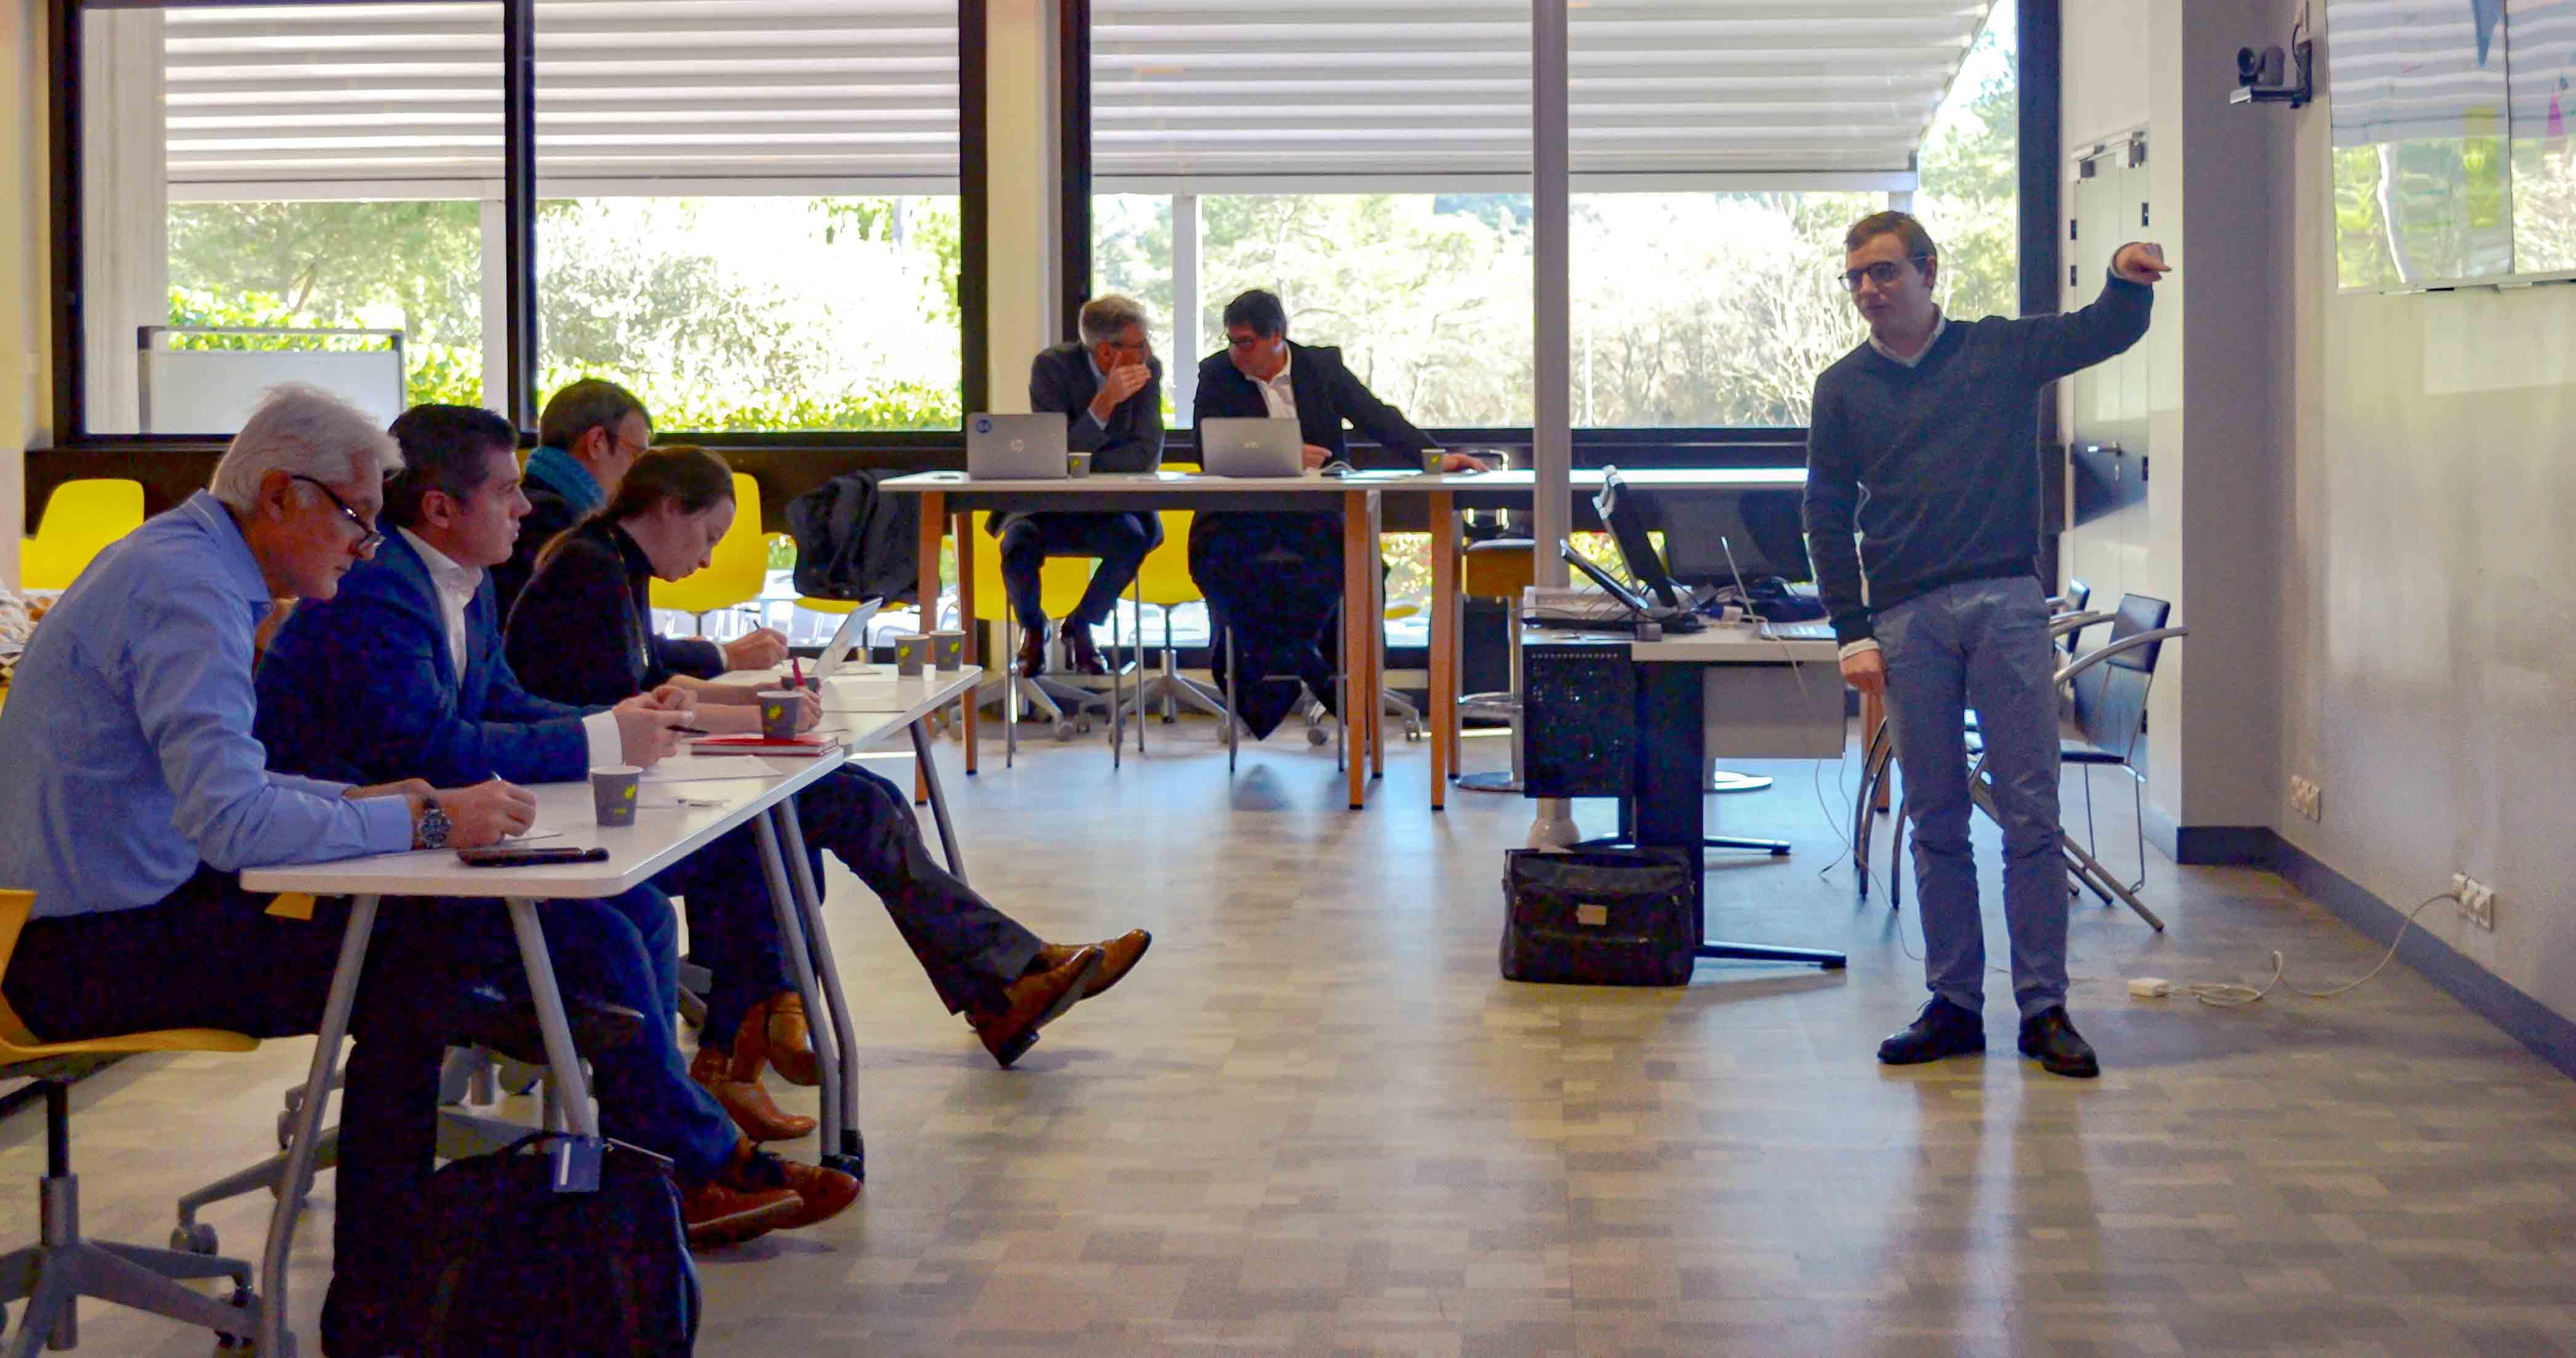 skema ventures bootsrap workshop 3